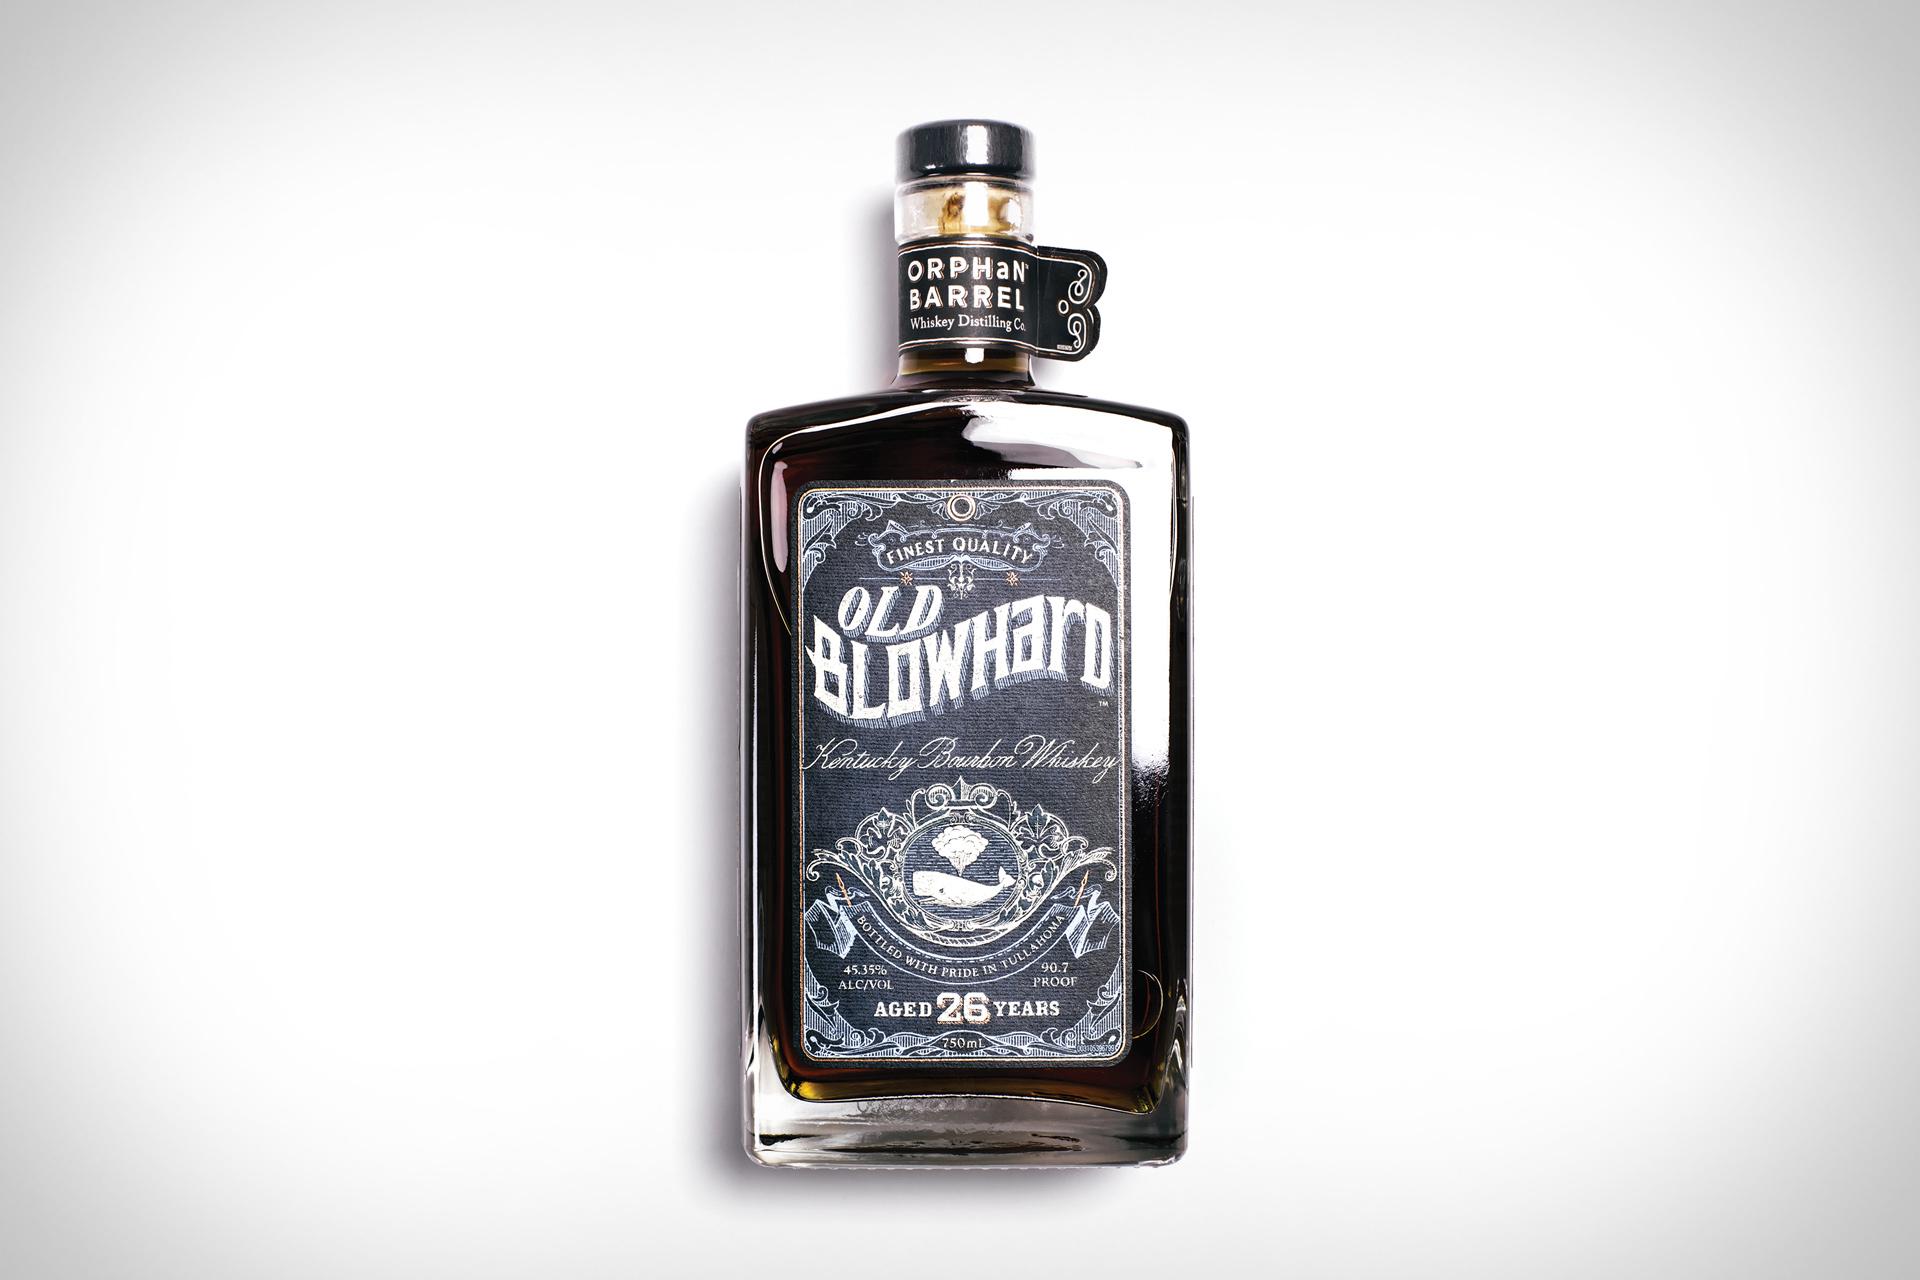 Orphan Barrel Old Blowhard Bourbon